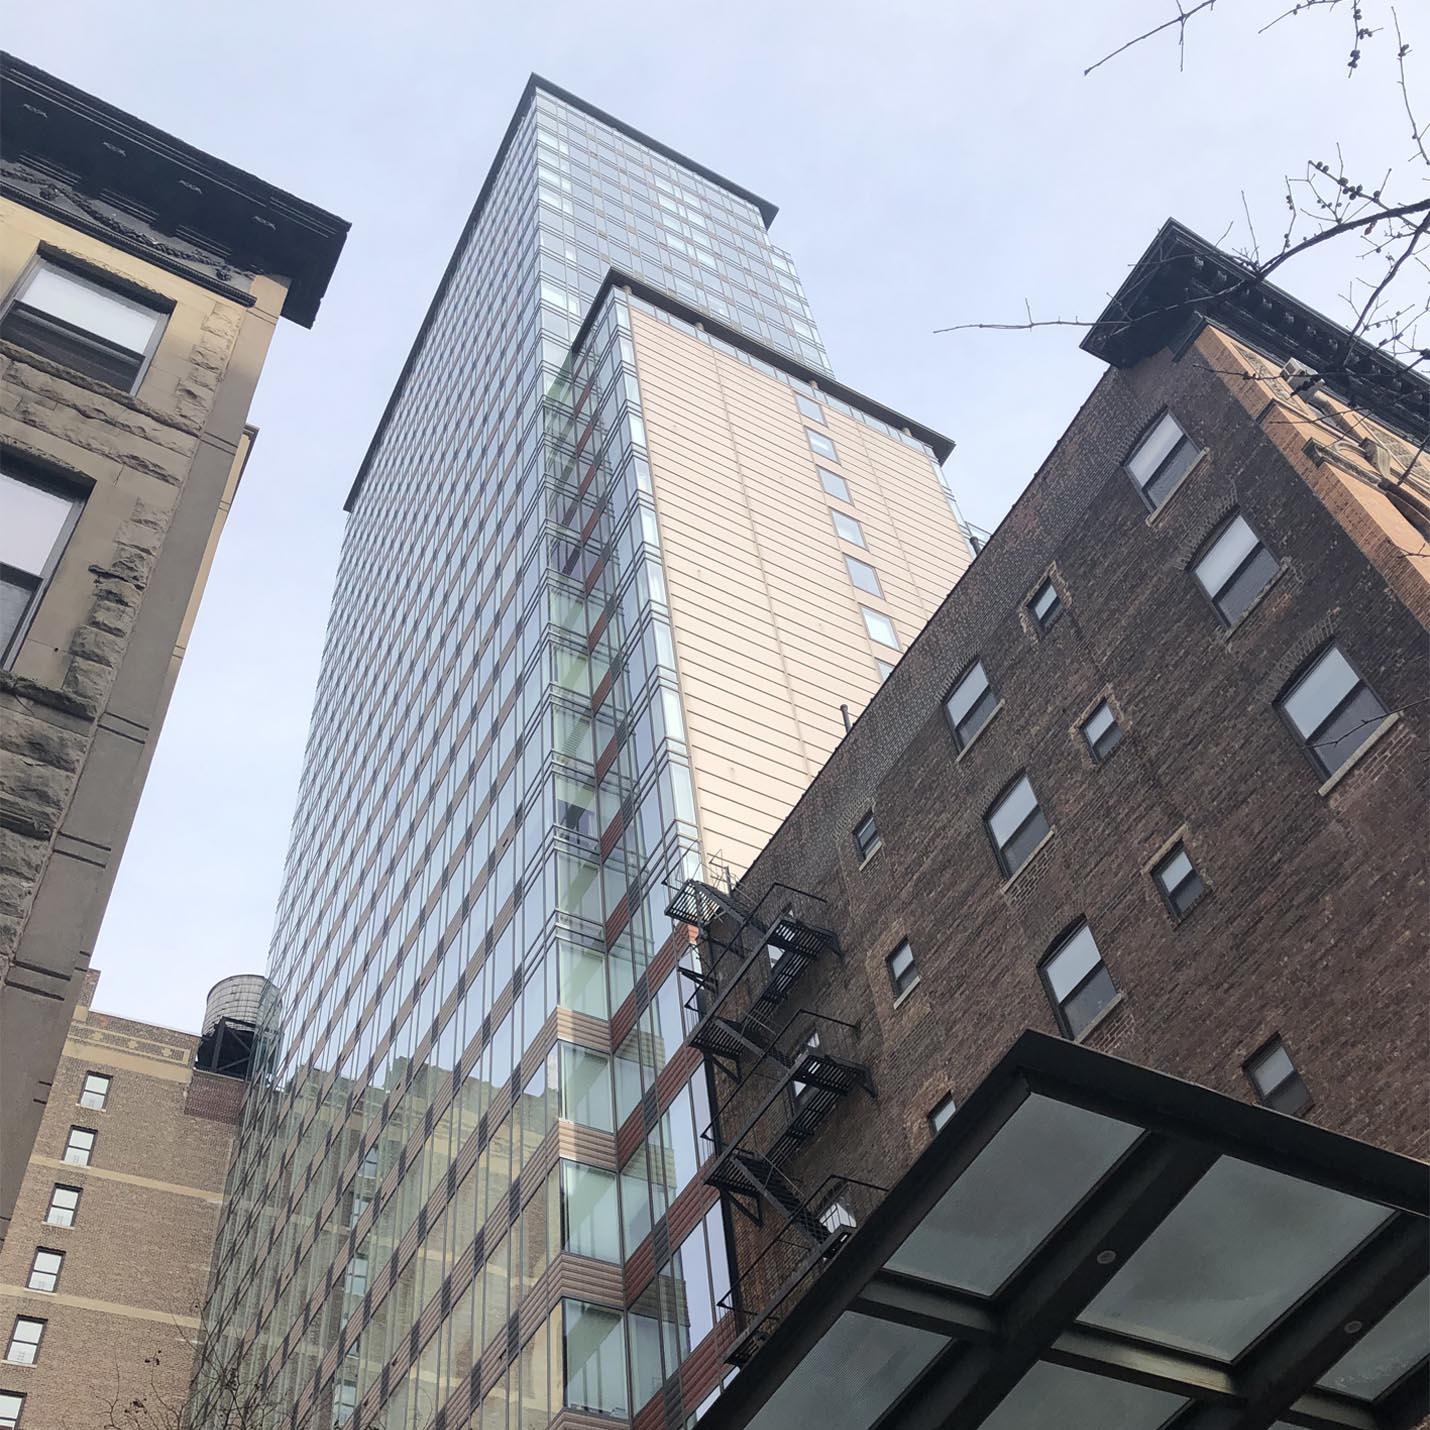 Ariel West Building Looking Up